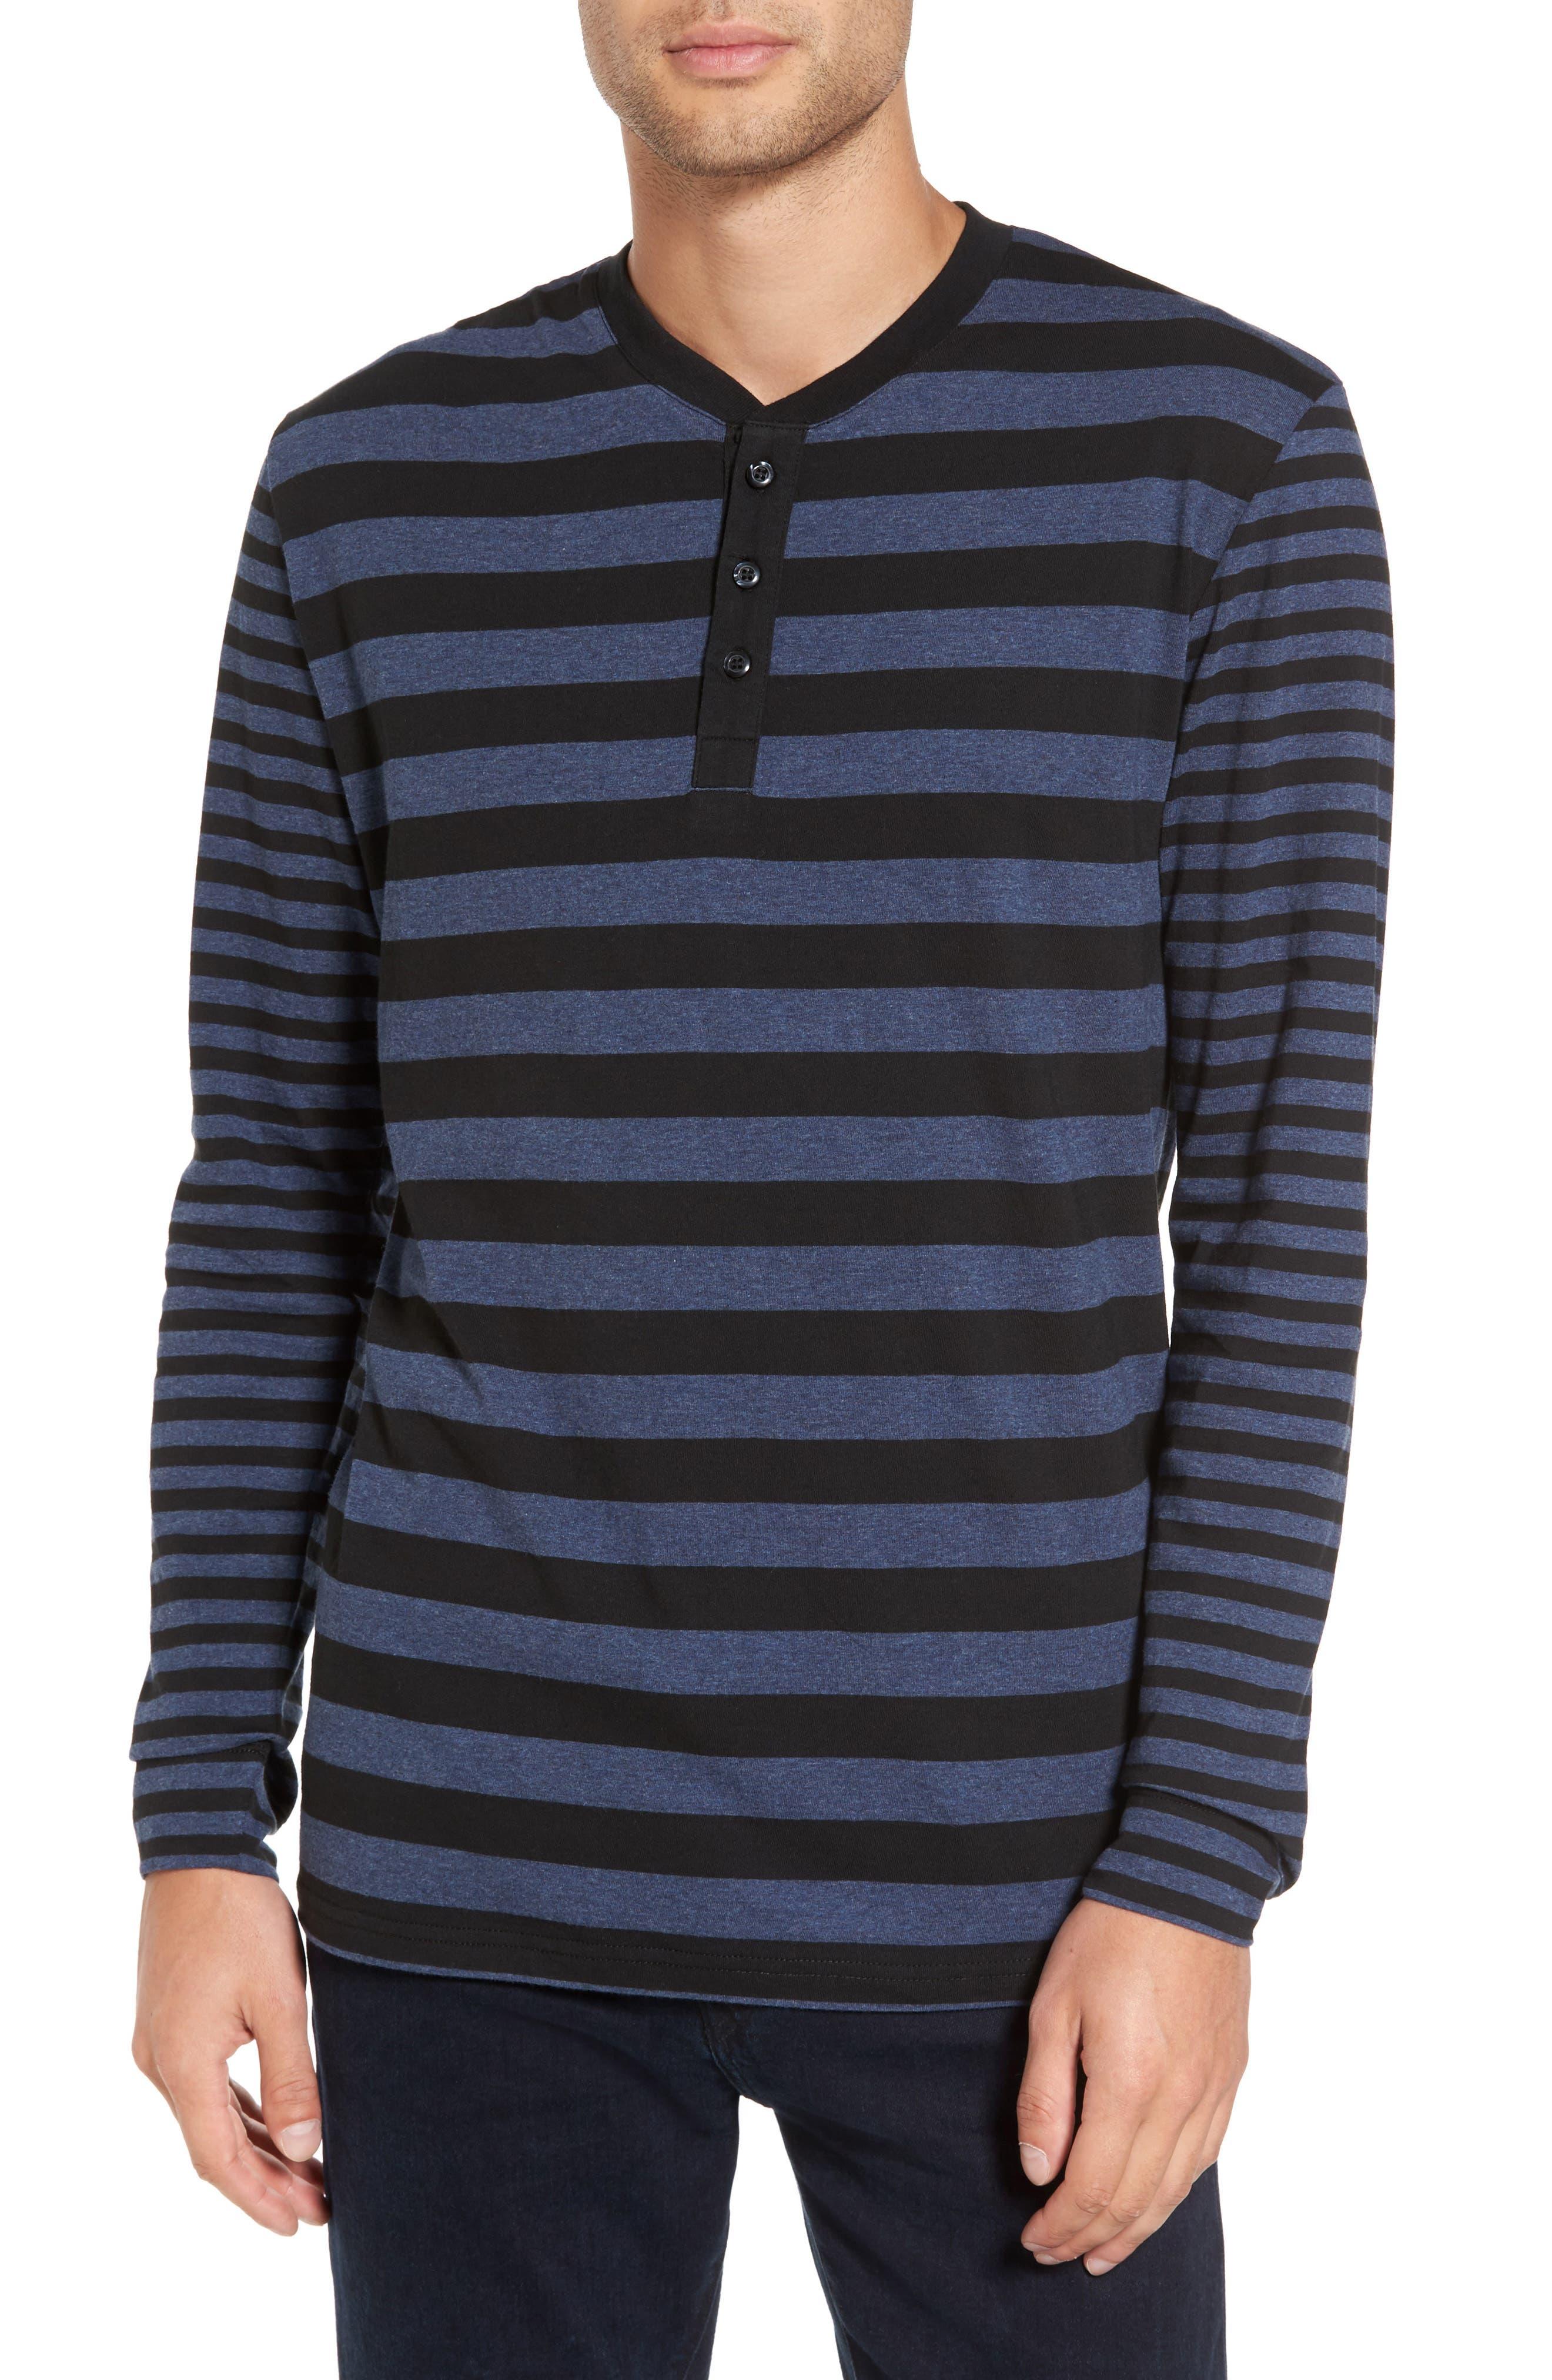 Main Image - Slate & Stone Striped Long Sleeve Henley T-Shirt